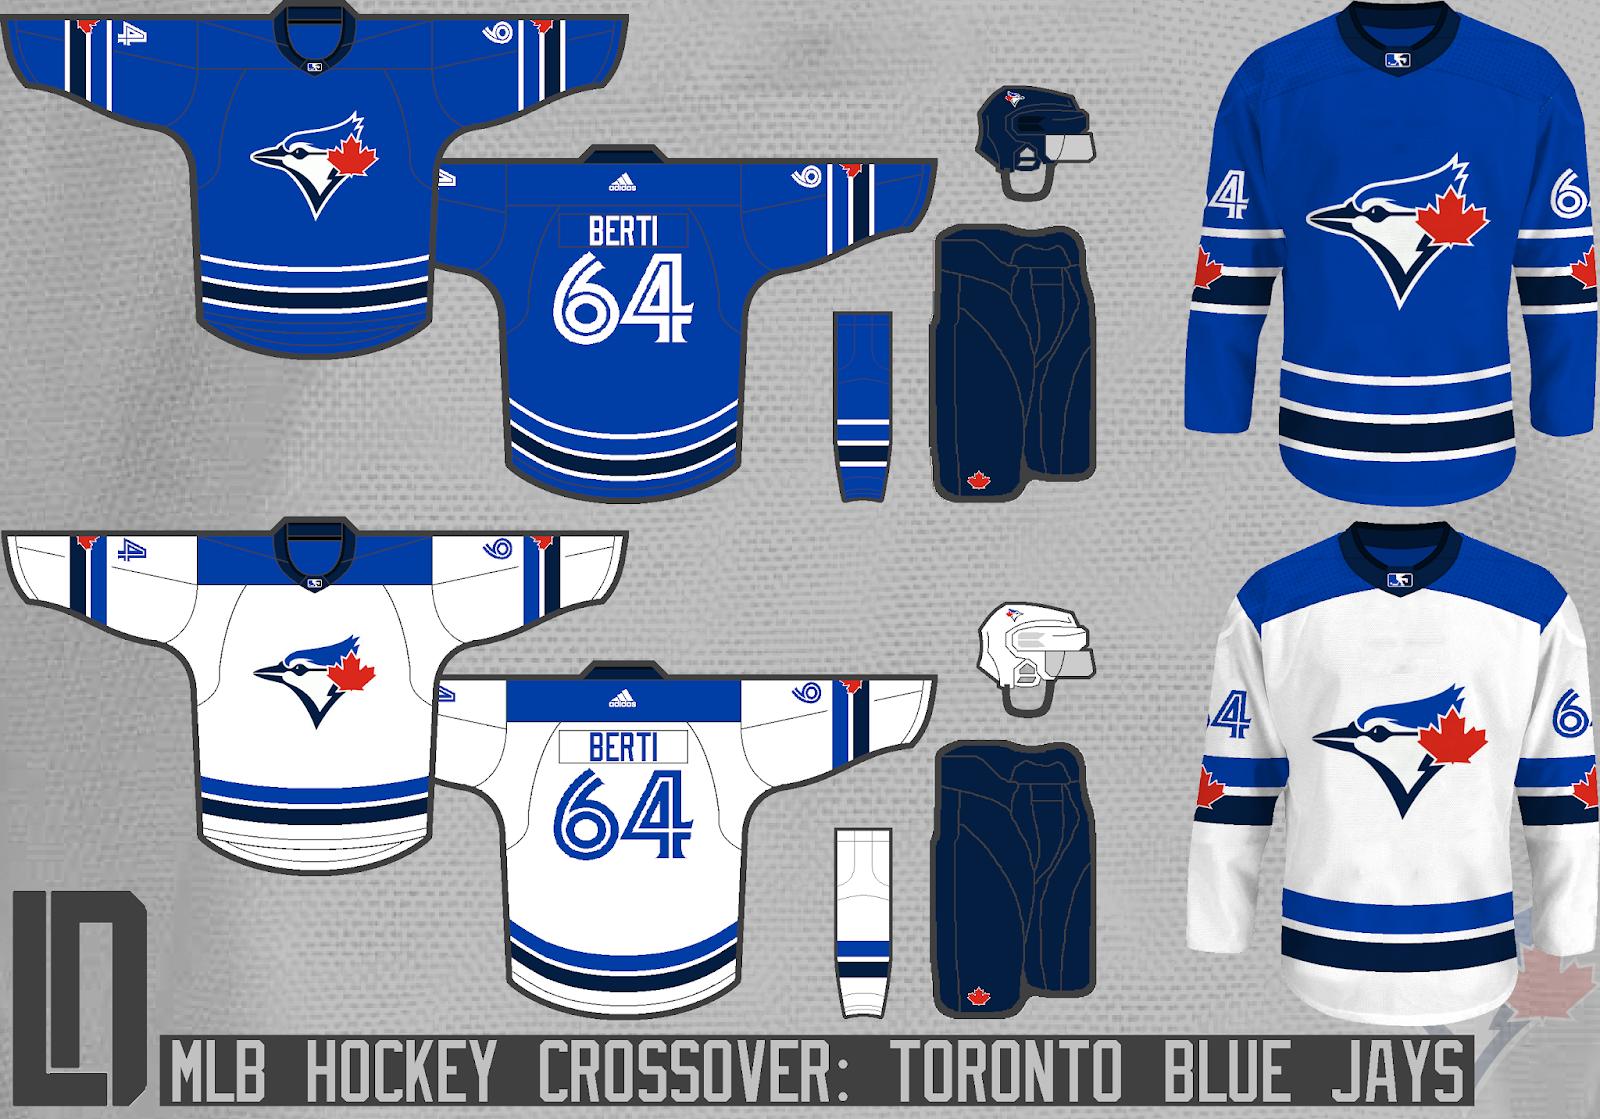 Toronto+Blue+Jays+Concept.png